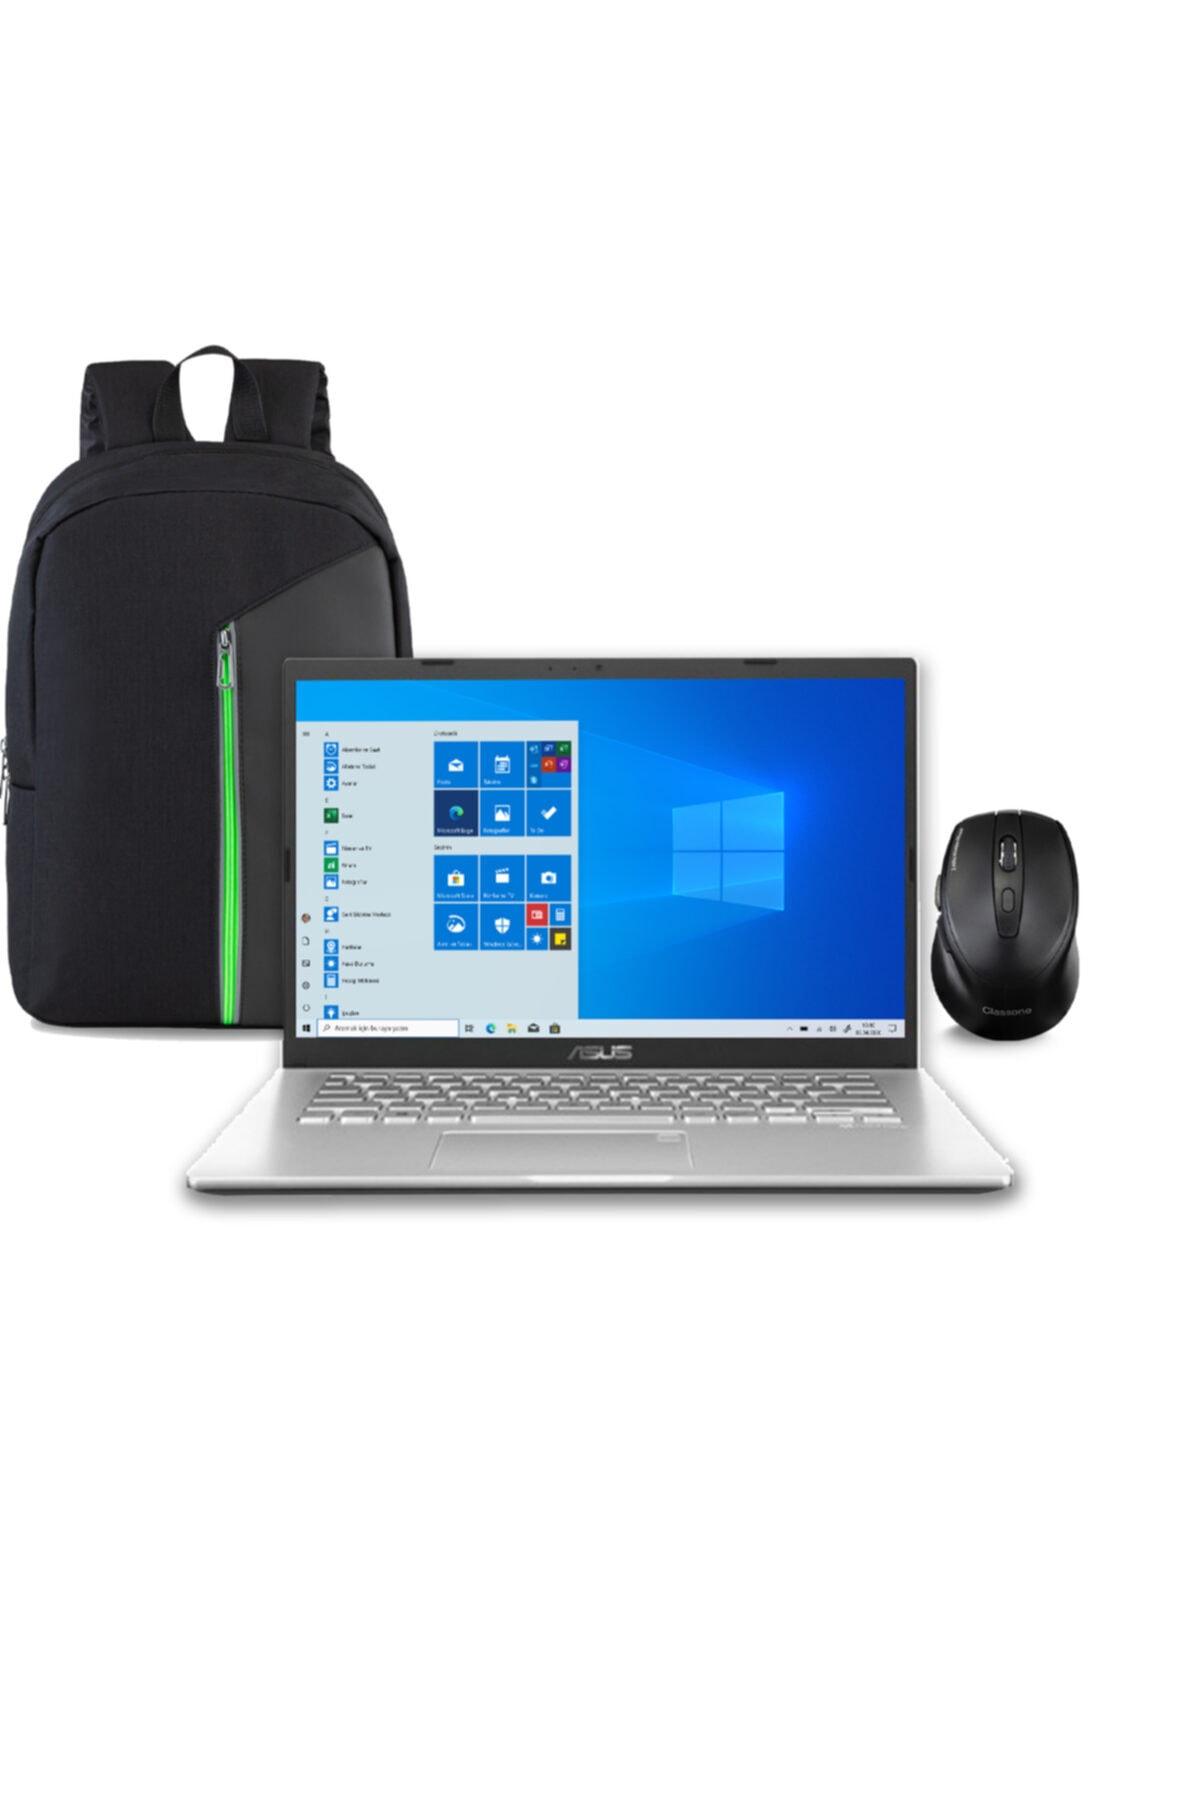 "D409ba-bv167t Amd A6-9225 4 Gb 128 Gb Ssd 14"" Hd Windows 10 Home + Çanta Ve Mouse"